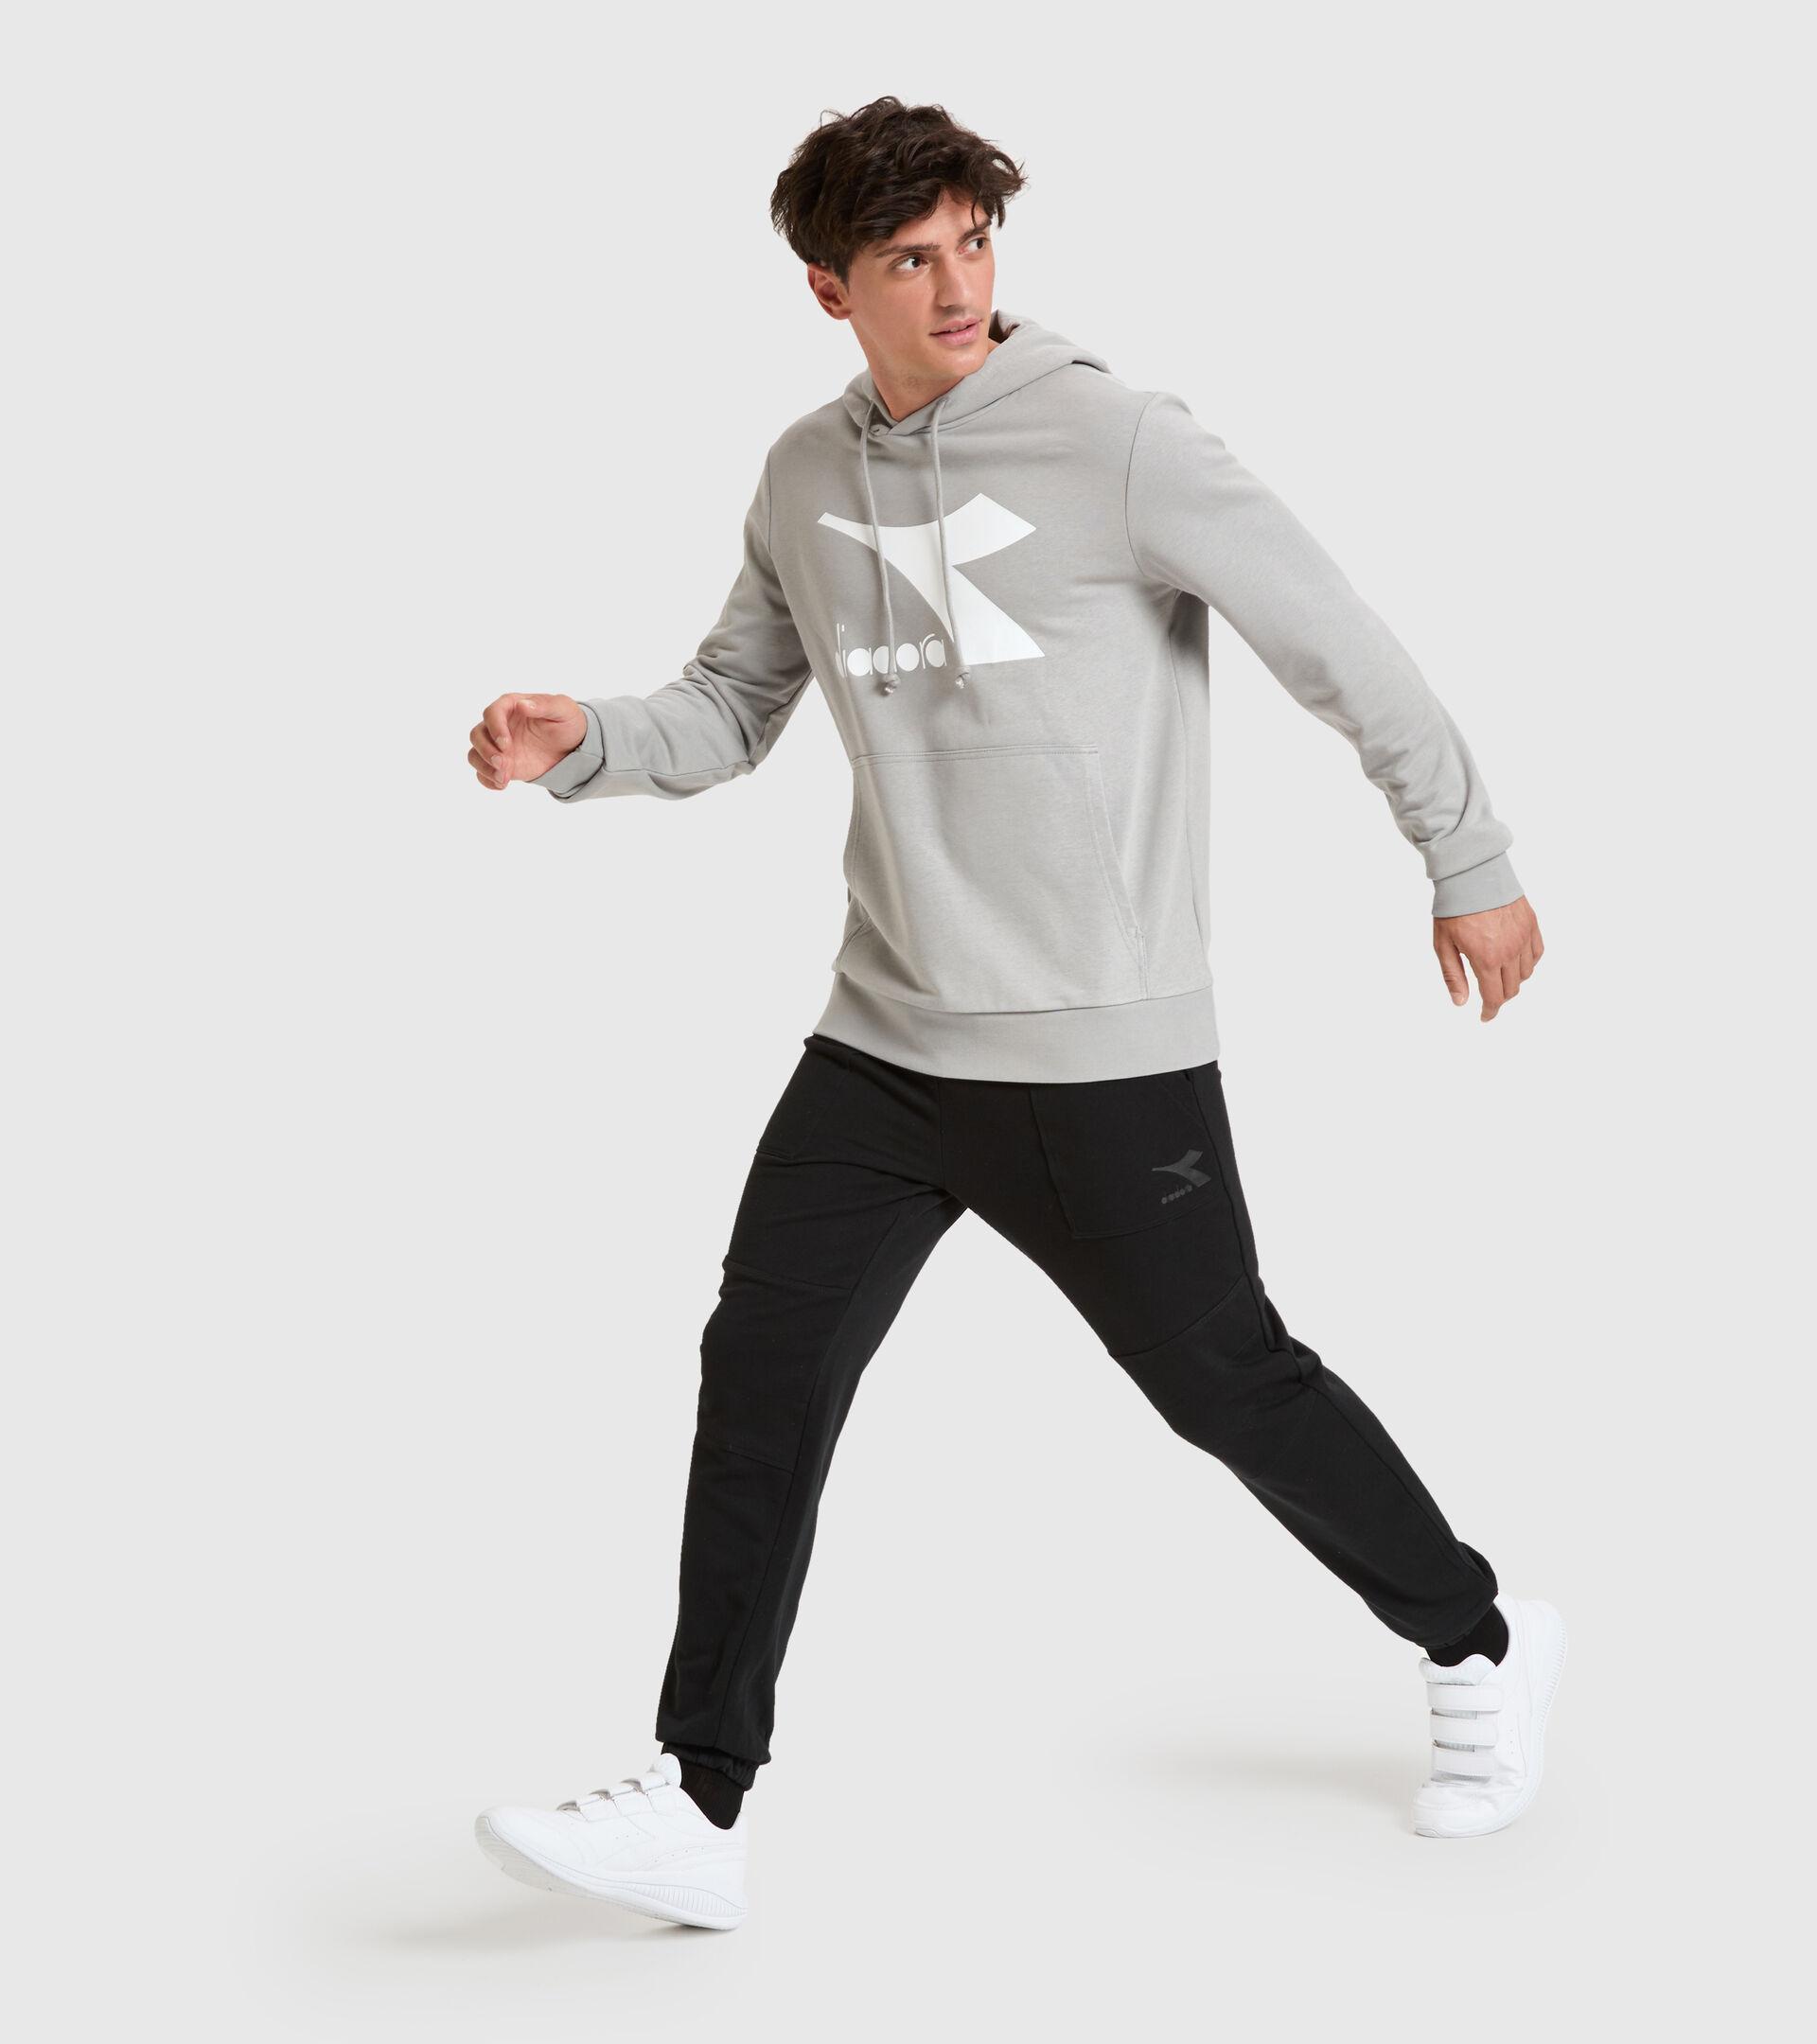 Hooded sweatshirt - Men HOODIE BIG LOGO GRAY MOUSE - Diadora